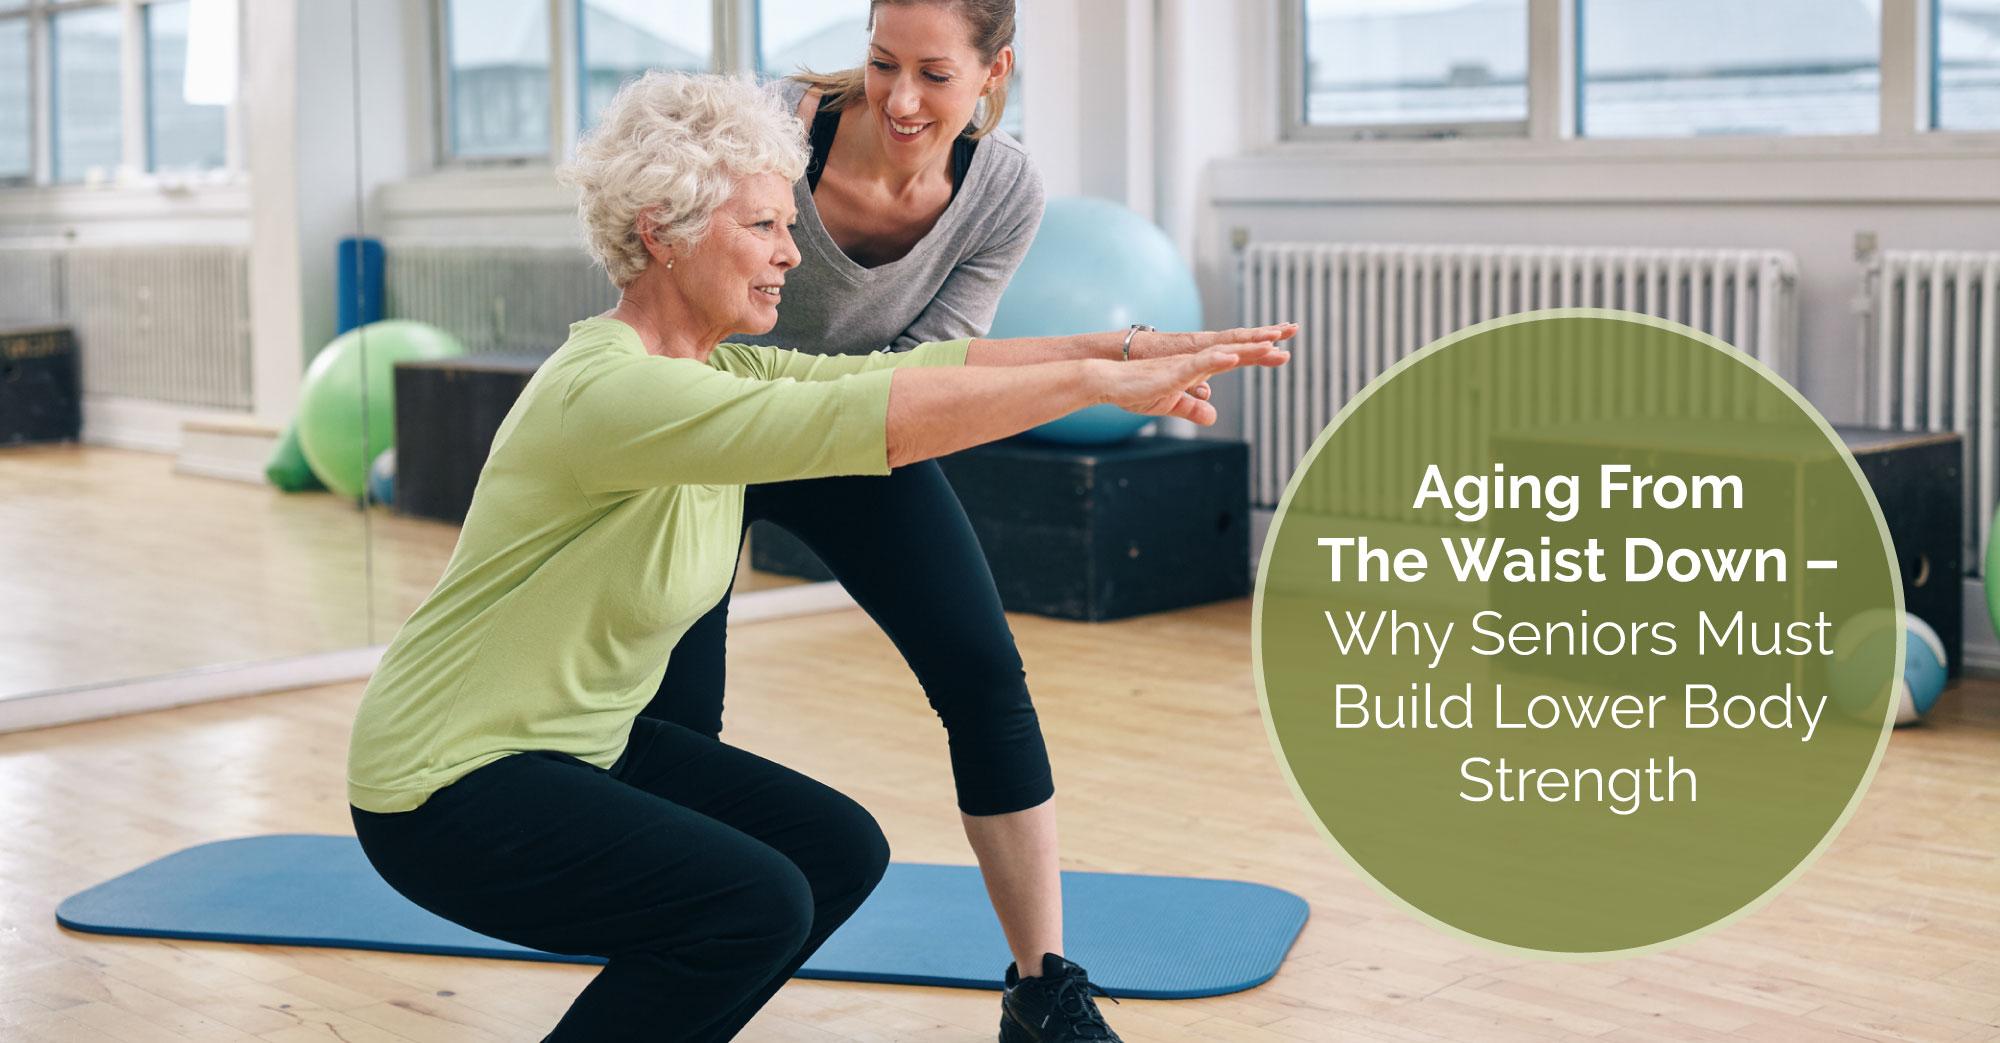 seniors-aging-waist-down